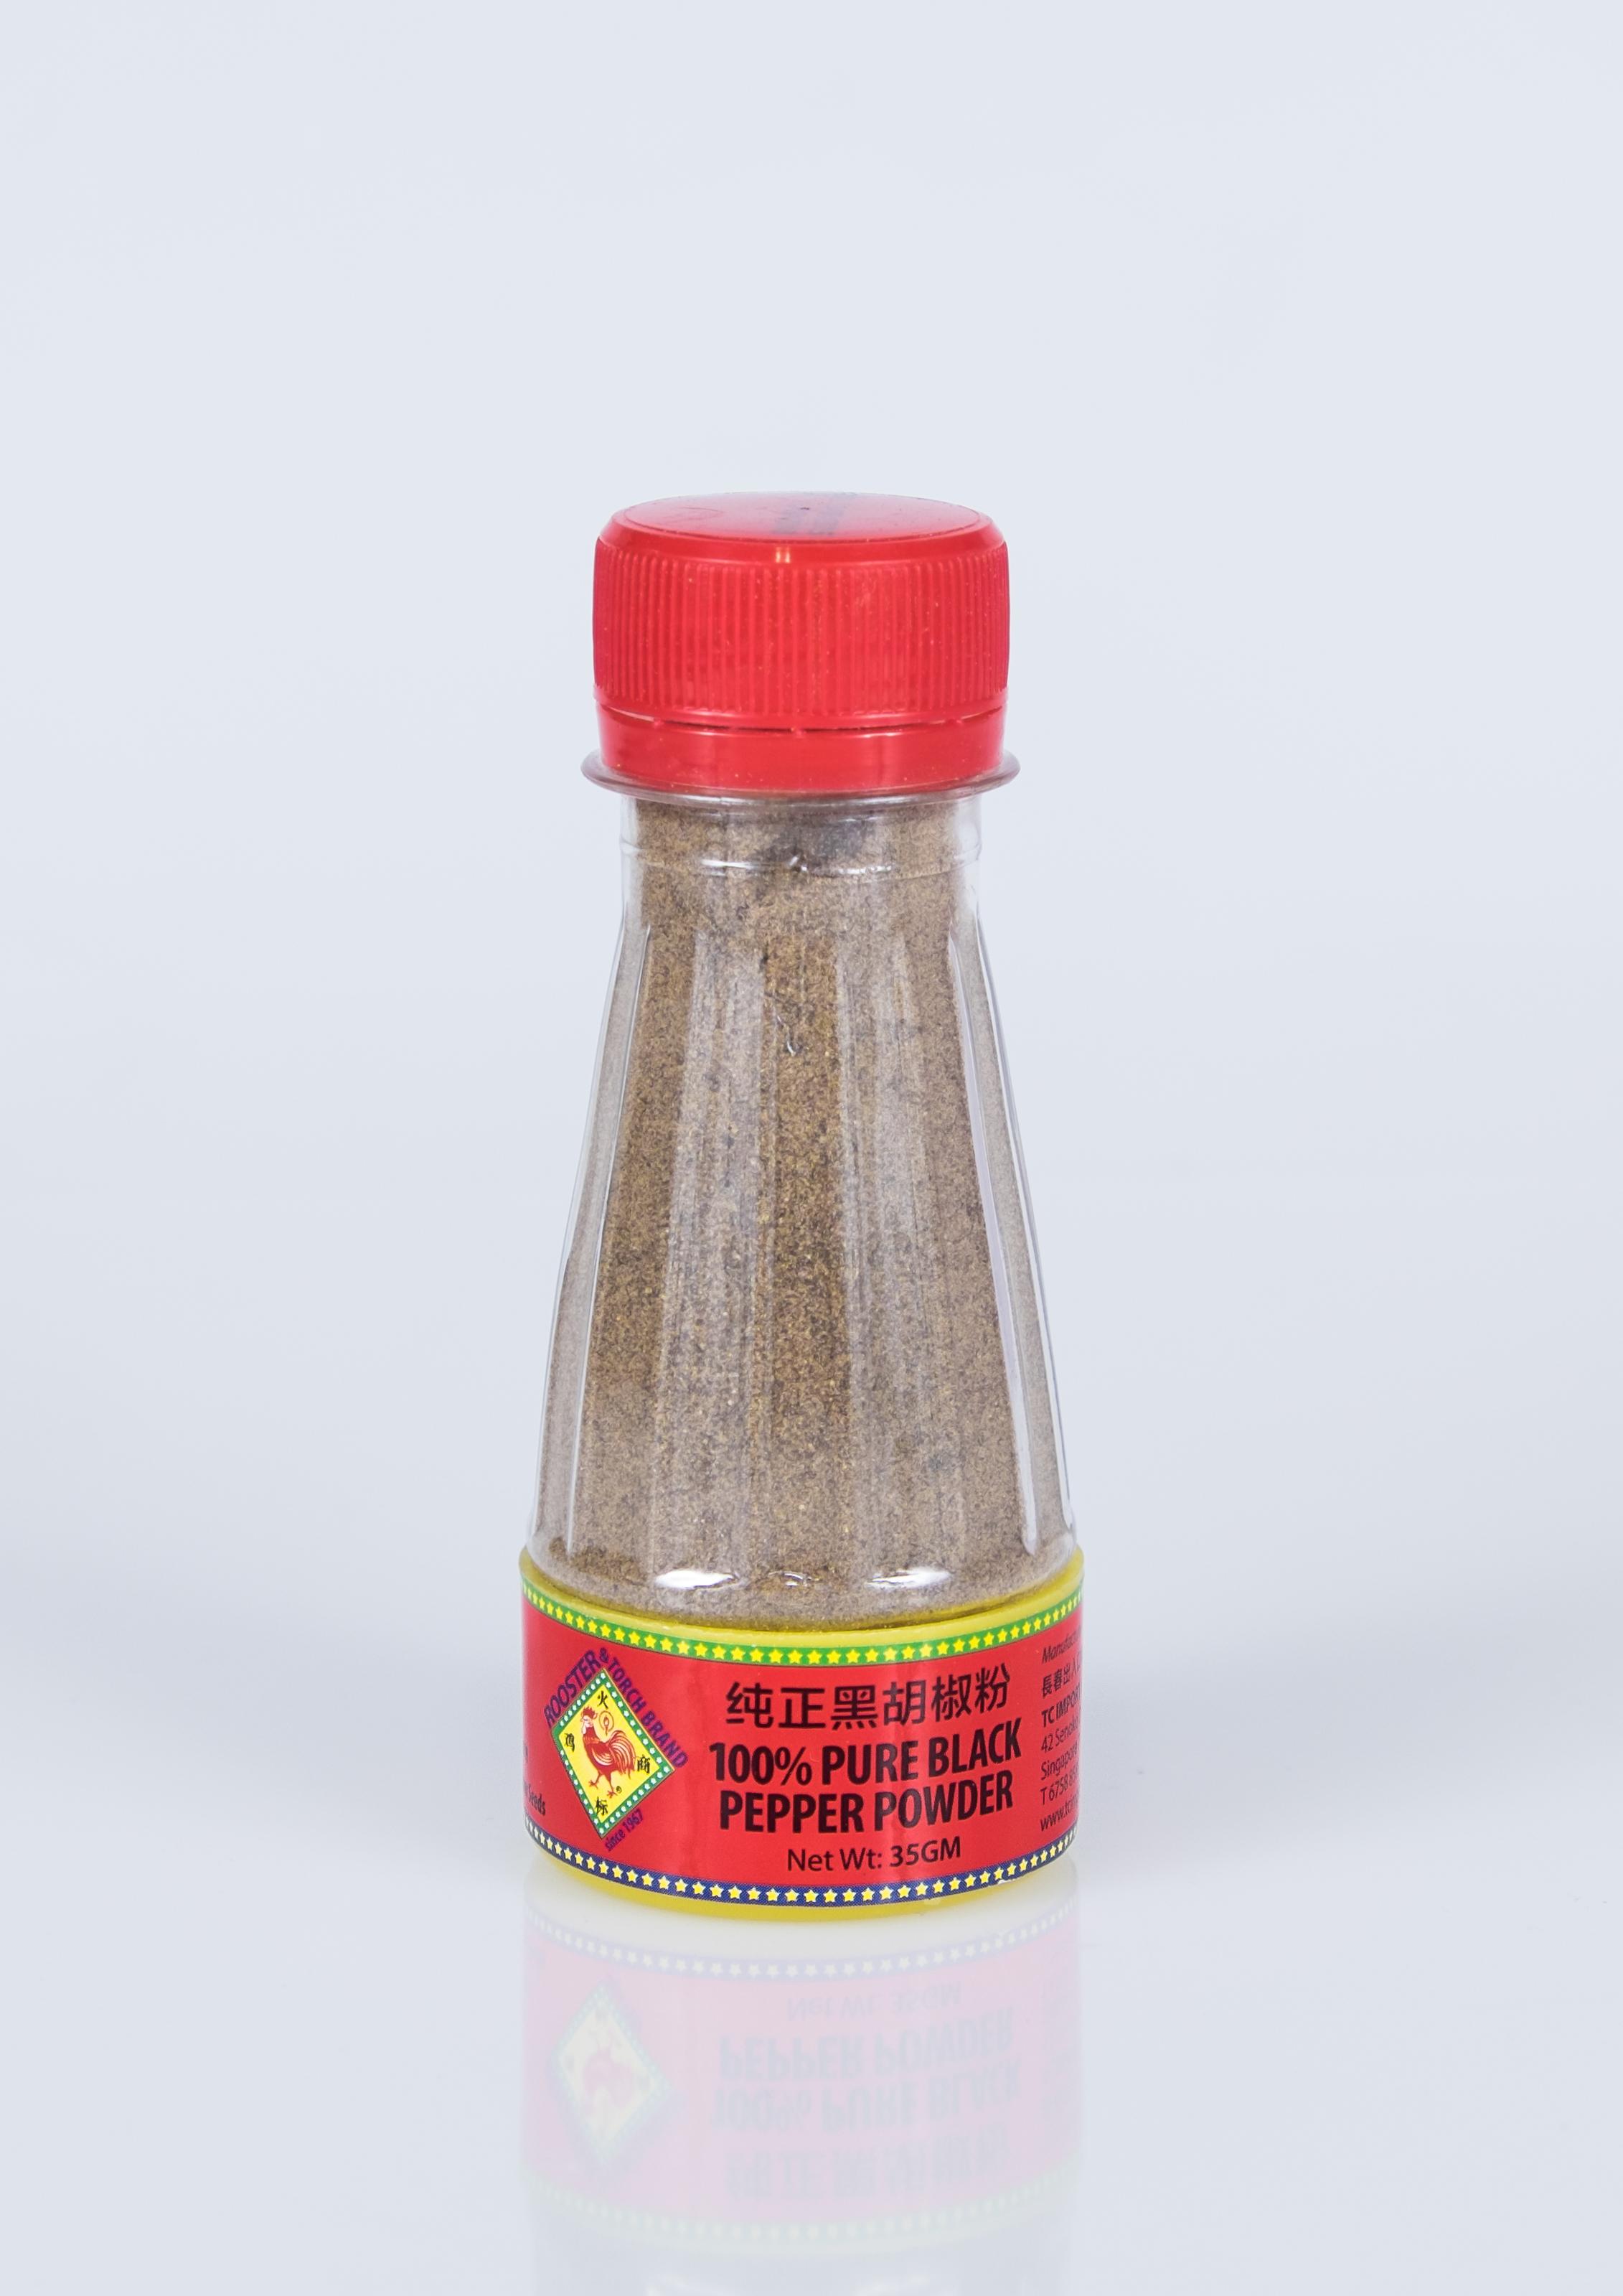 RT Black Pepper Powder 35g